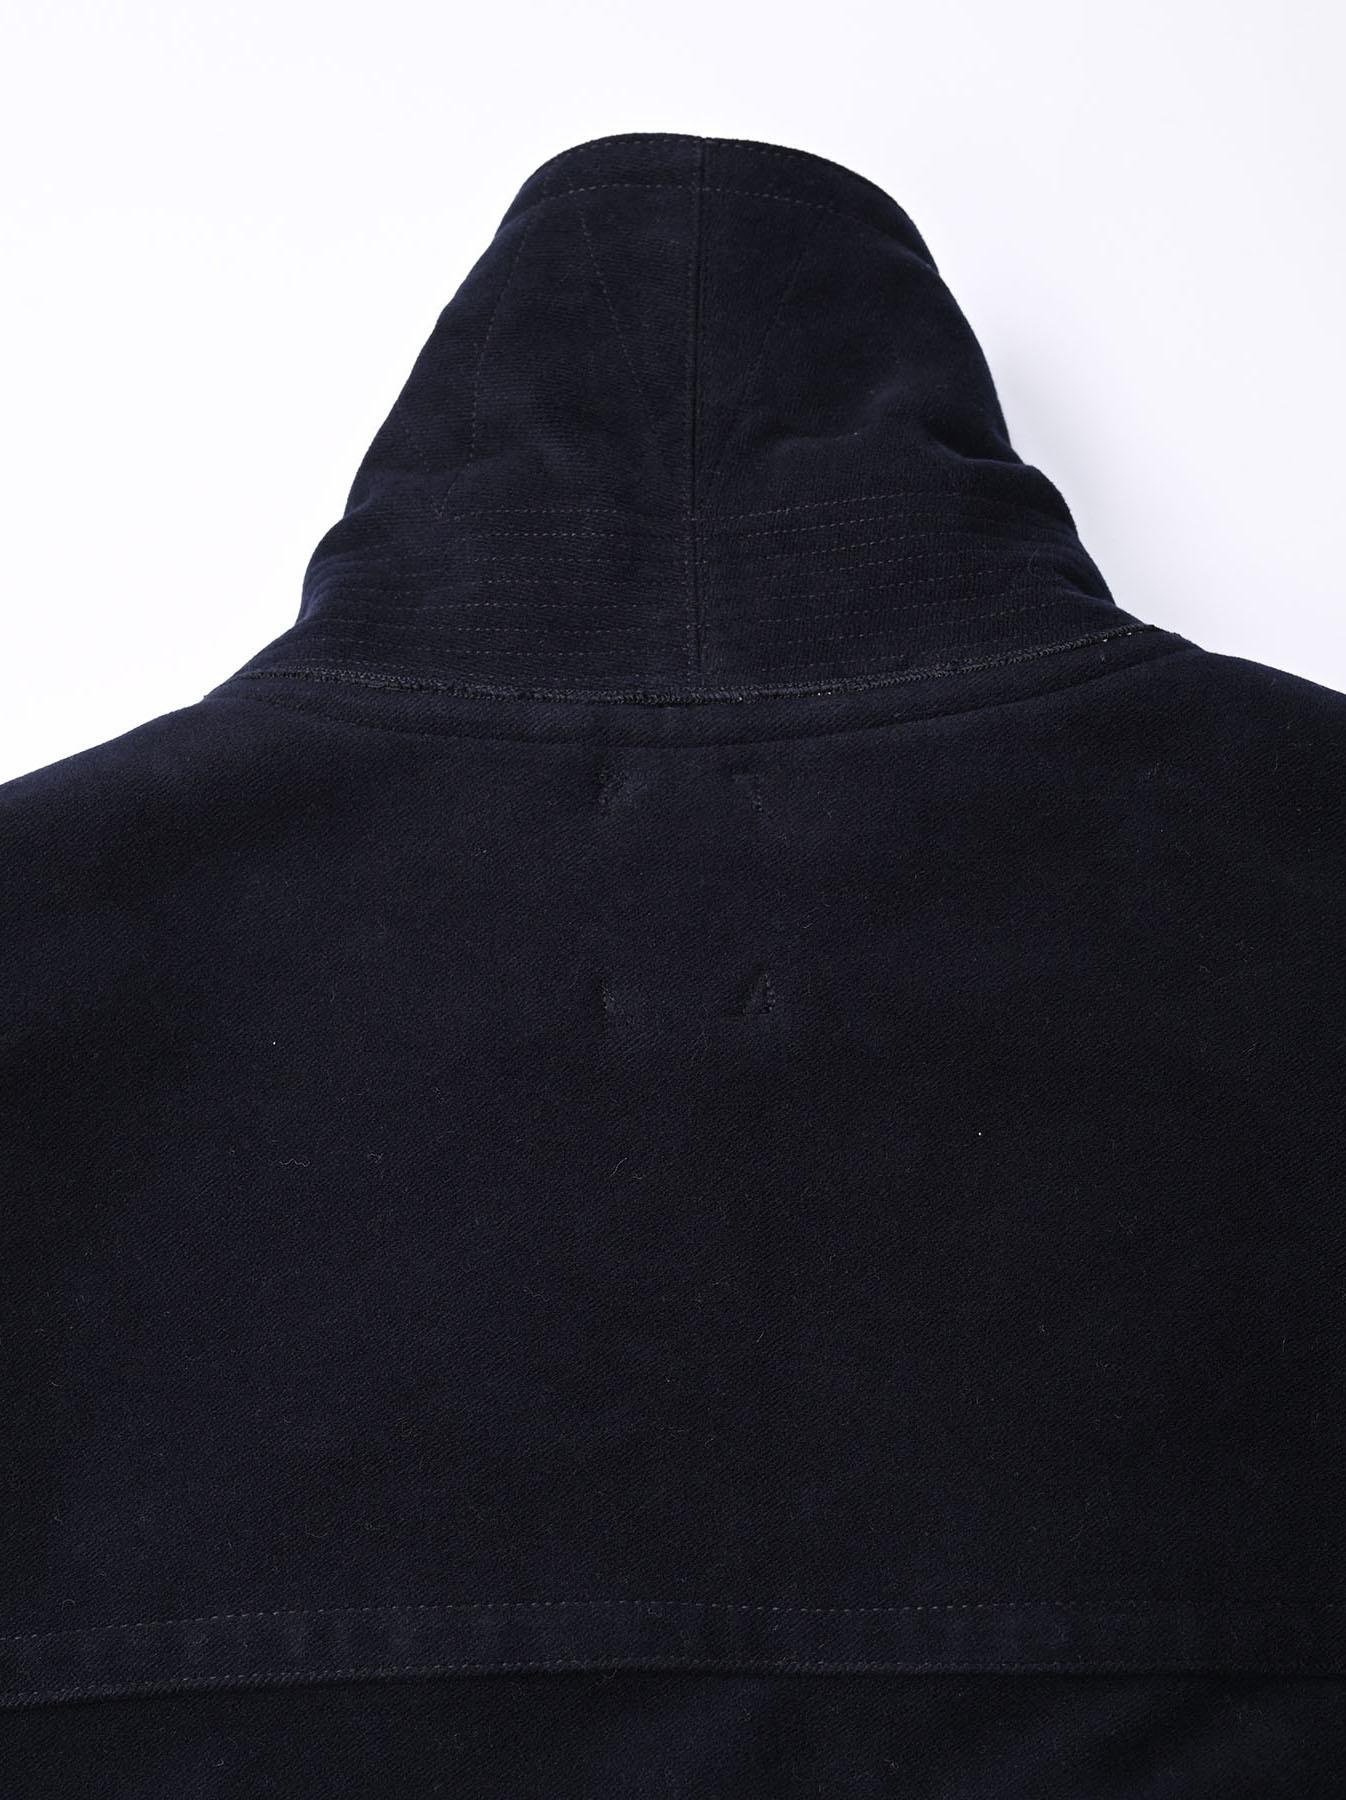 Thick Cotton Flannel Hayama Duffle Coat-6